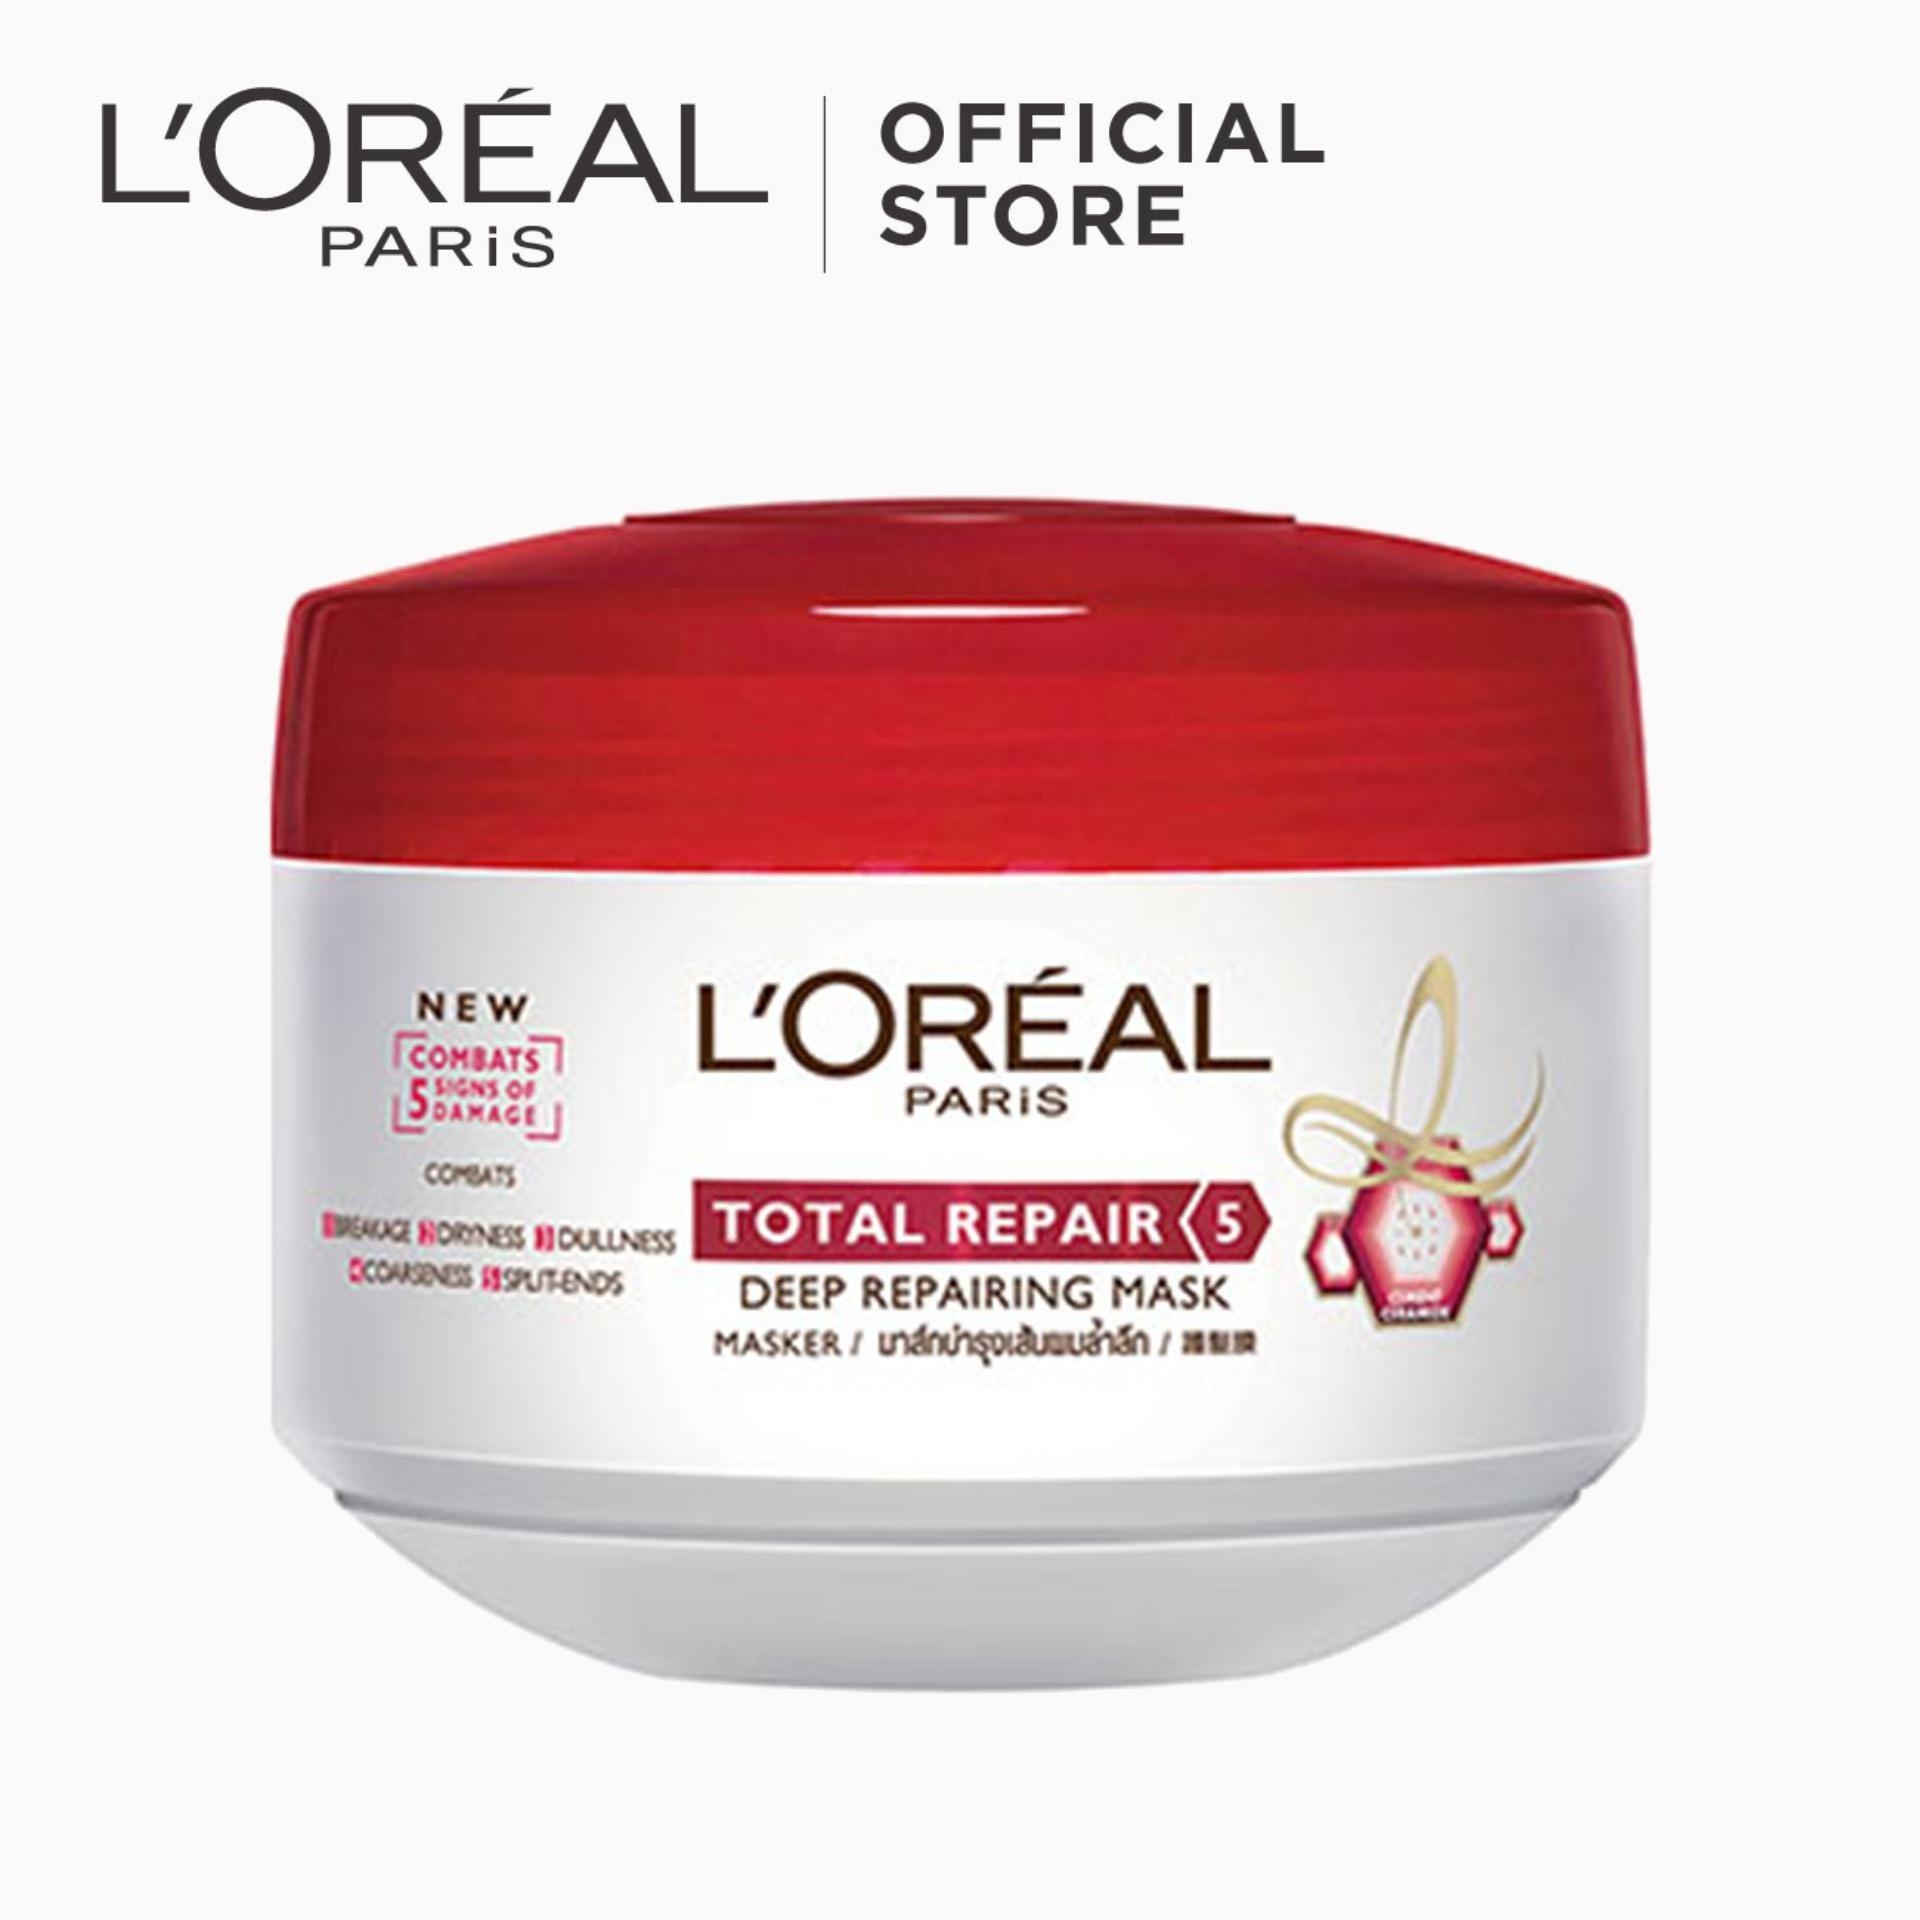 Total Repair 5 Mask 200ml By Loréal Paris Elseve By Loreal.